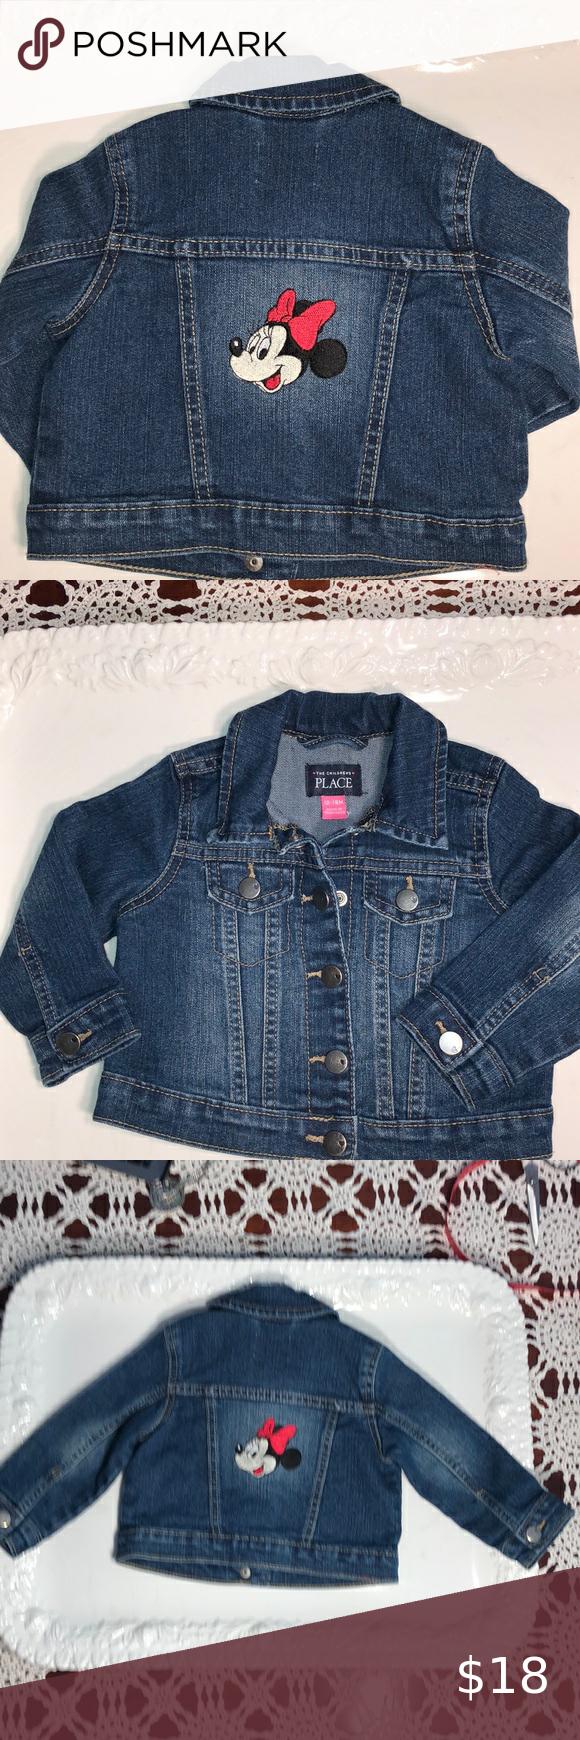 The Children S Place Minnie Mouse Jean Jacket Cute Jean Jackets Jean Jacket For Girls Baby Denim Jacket [ 1740 x 580 Pixel ]